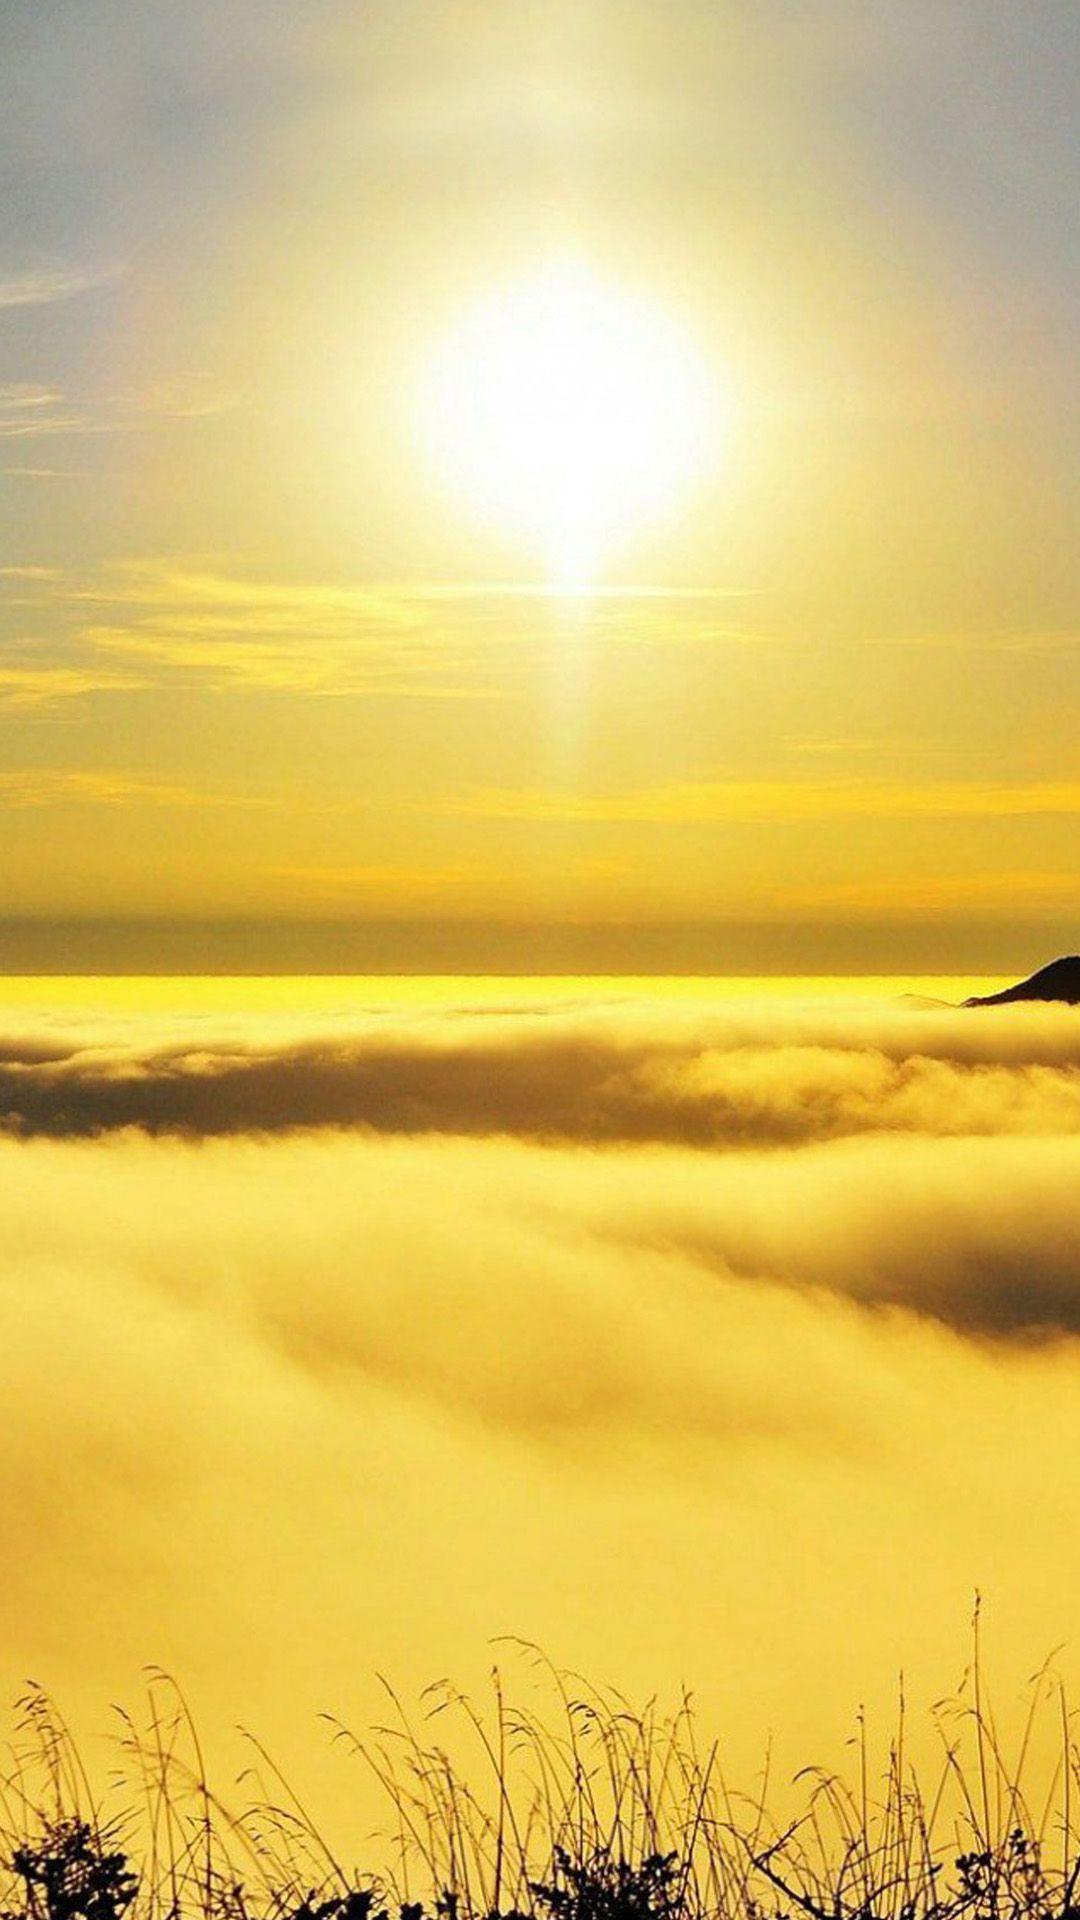 Sky Nature Yellow Horizon Atmospheric Phenomenon Sunrise In 2020 Sunset Iphone Wallpaper Sunset Landscape Landscape